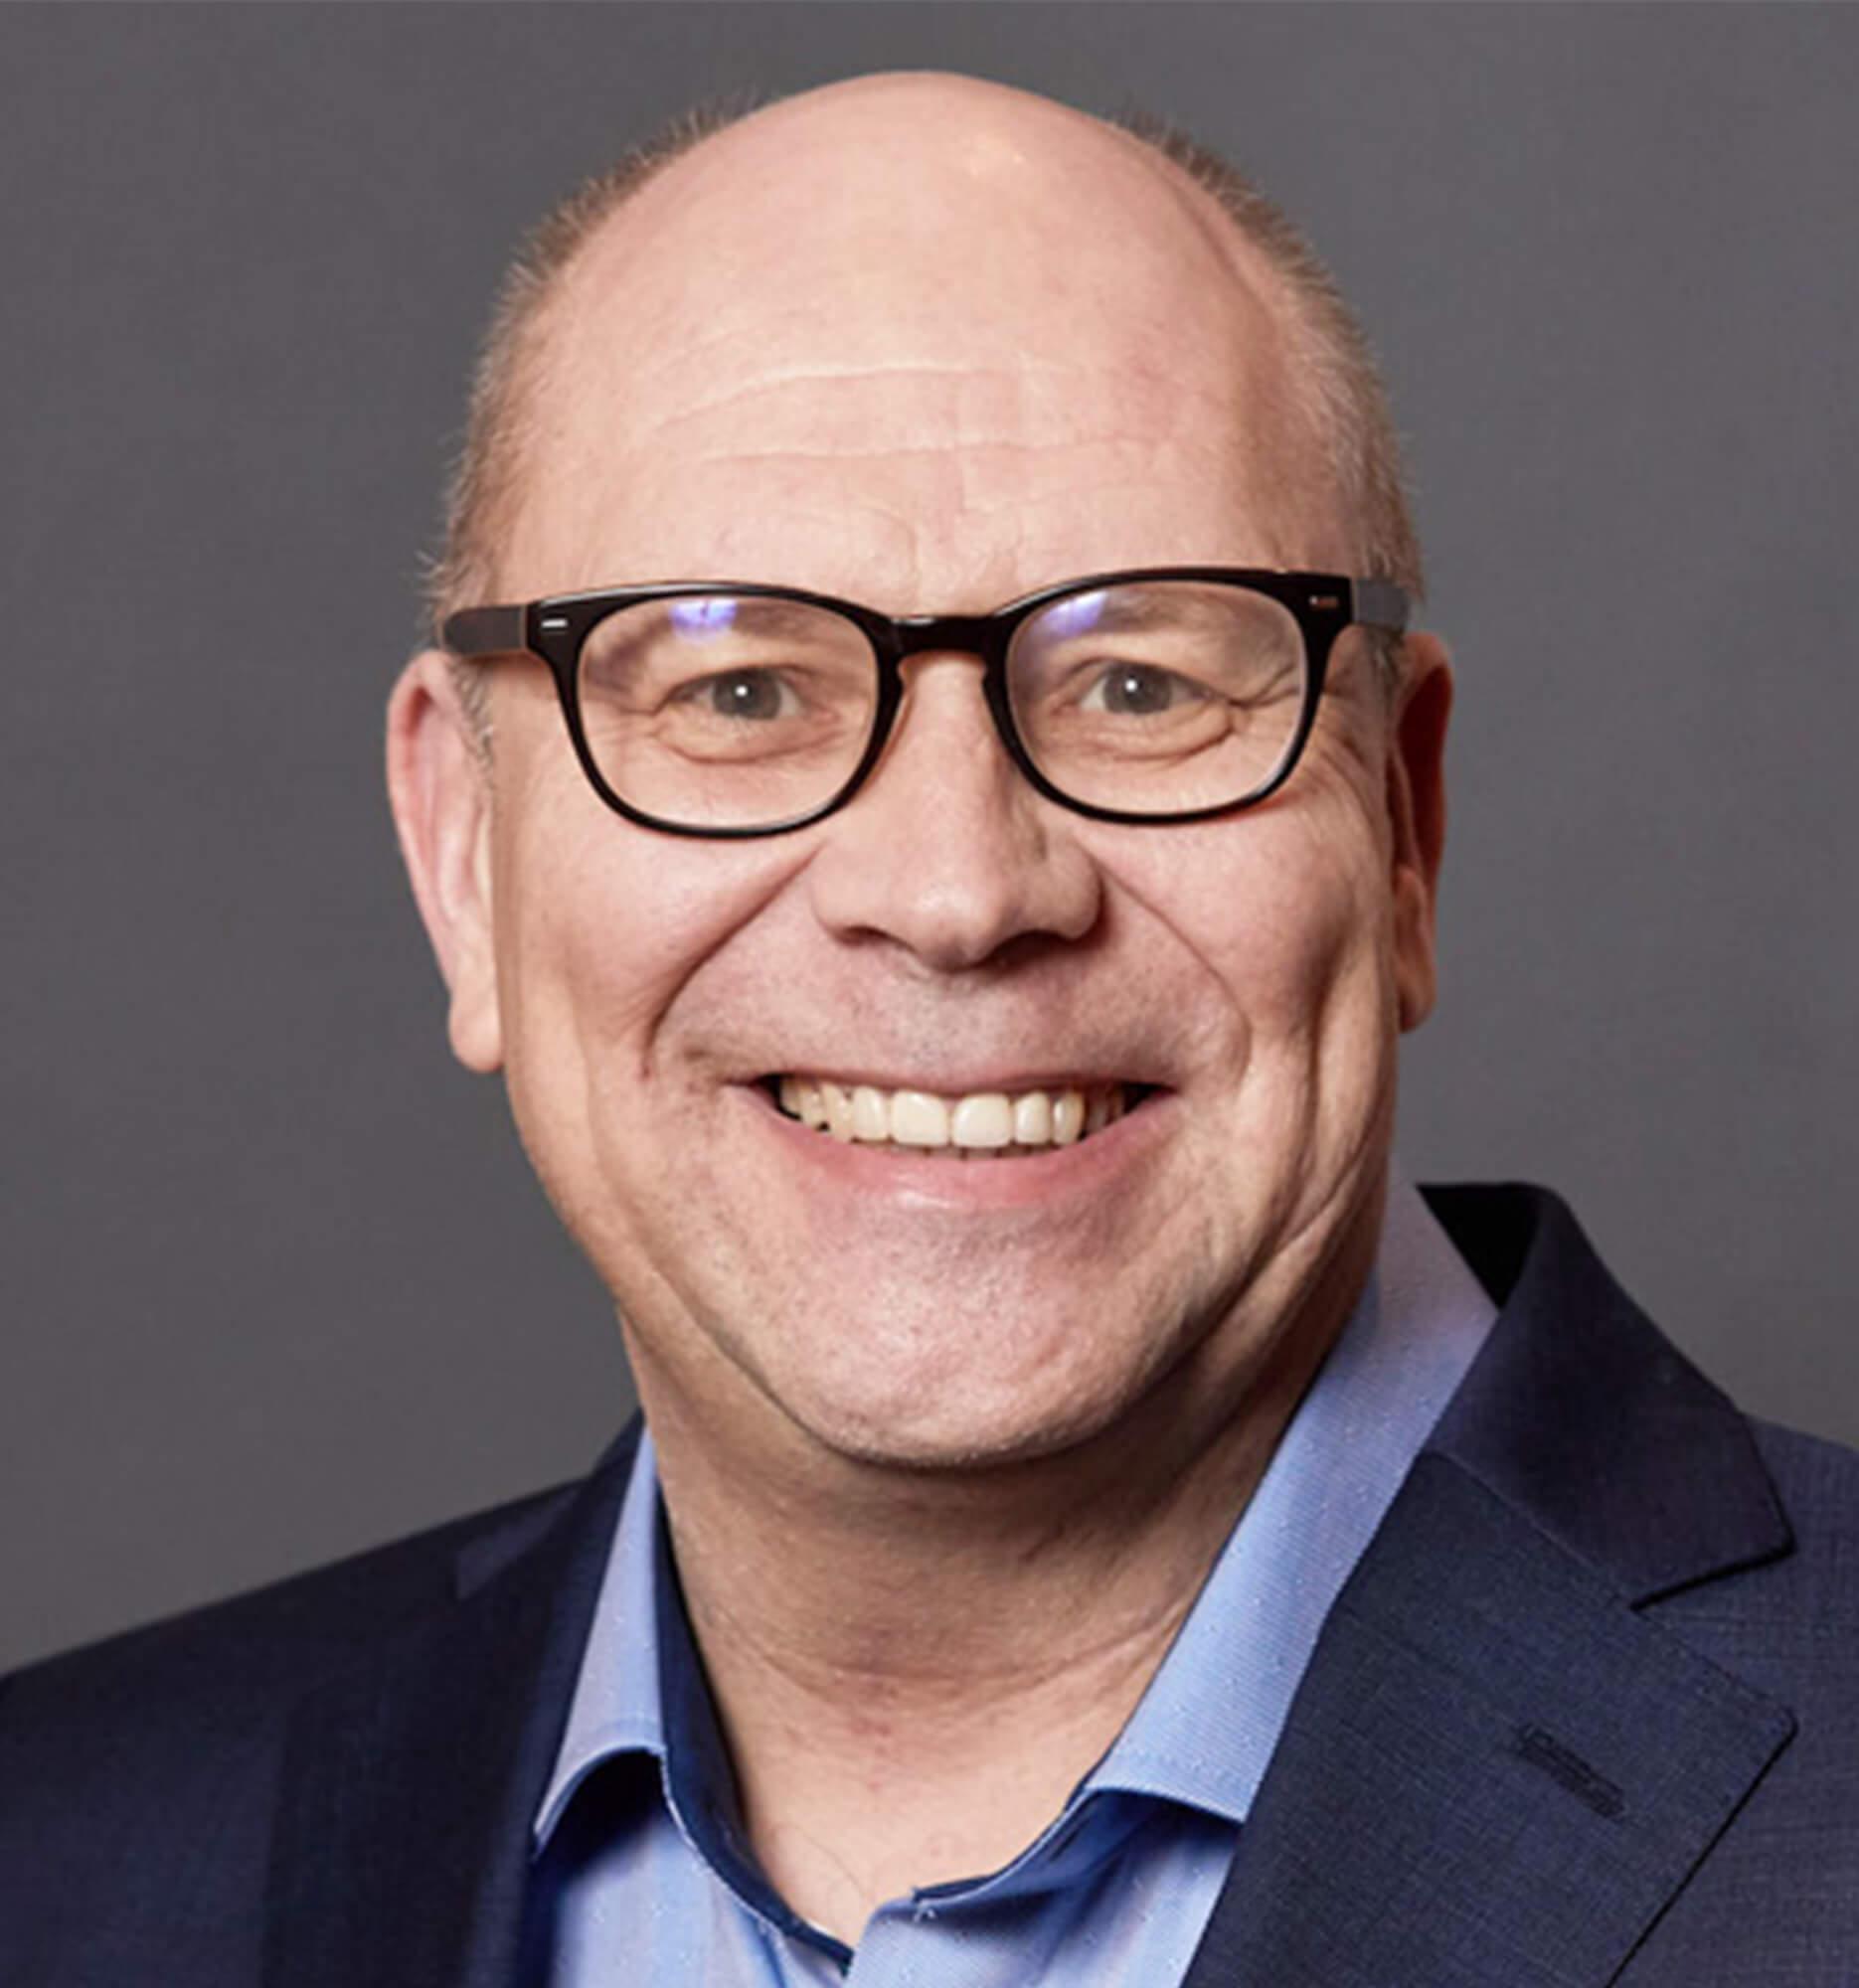 Dr. Stefan Wess Beirat der YAVEON